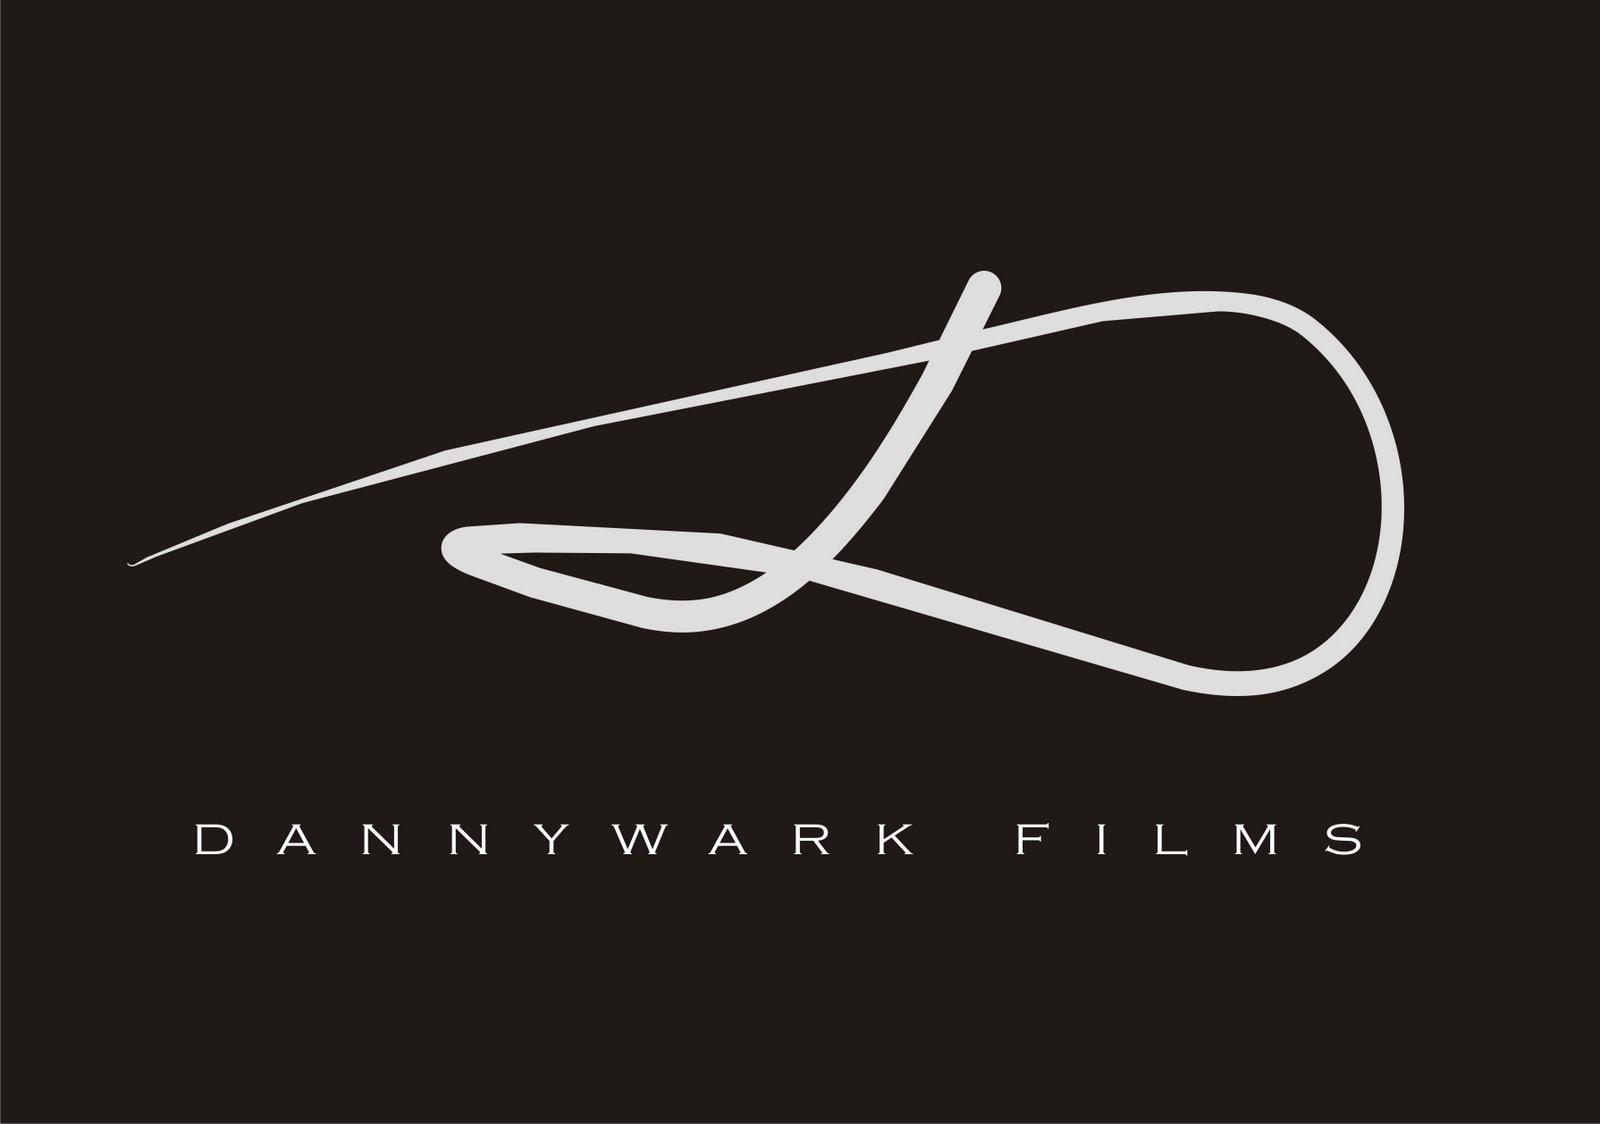 DANNYWARK FILMS